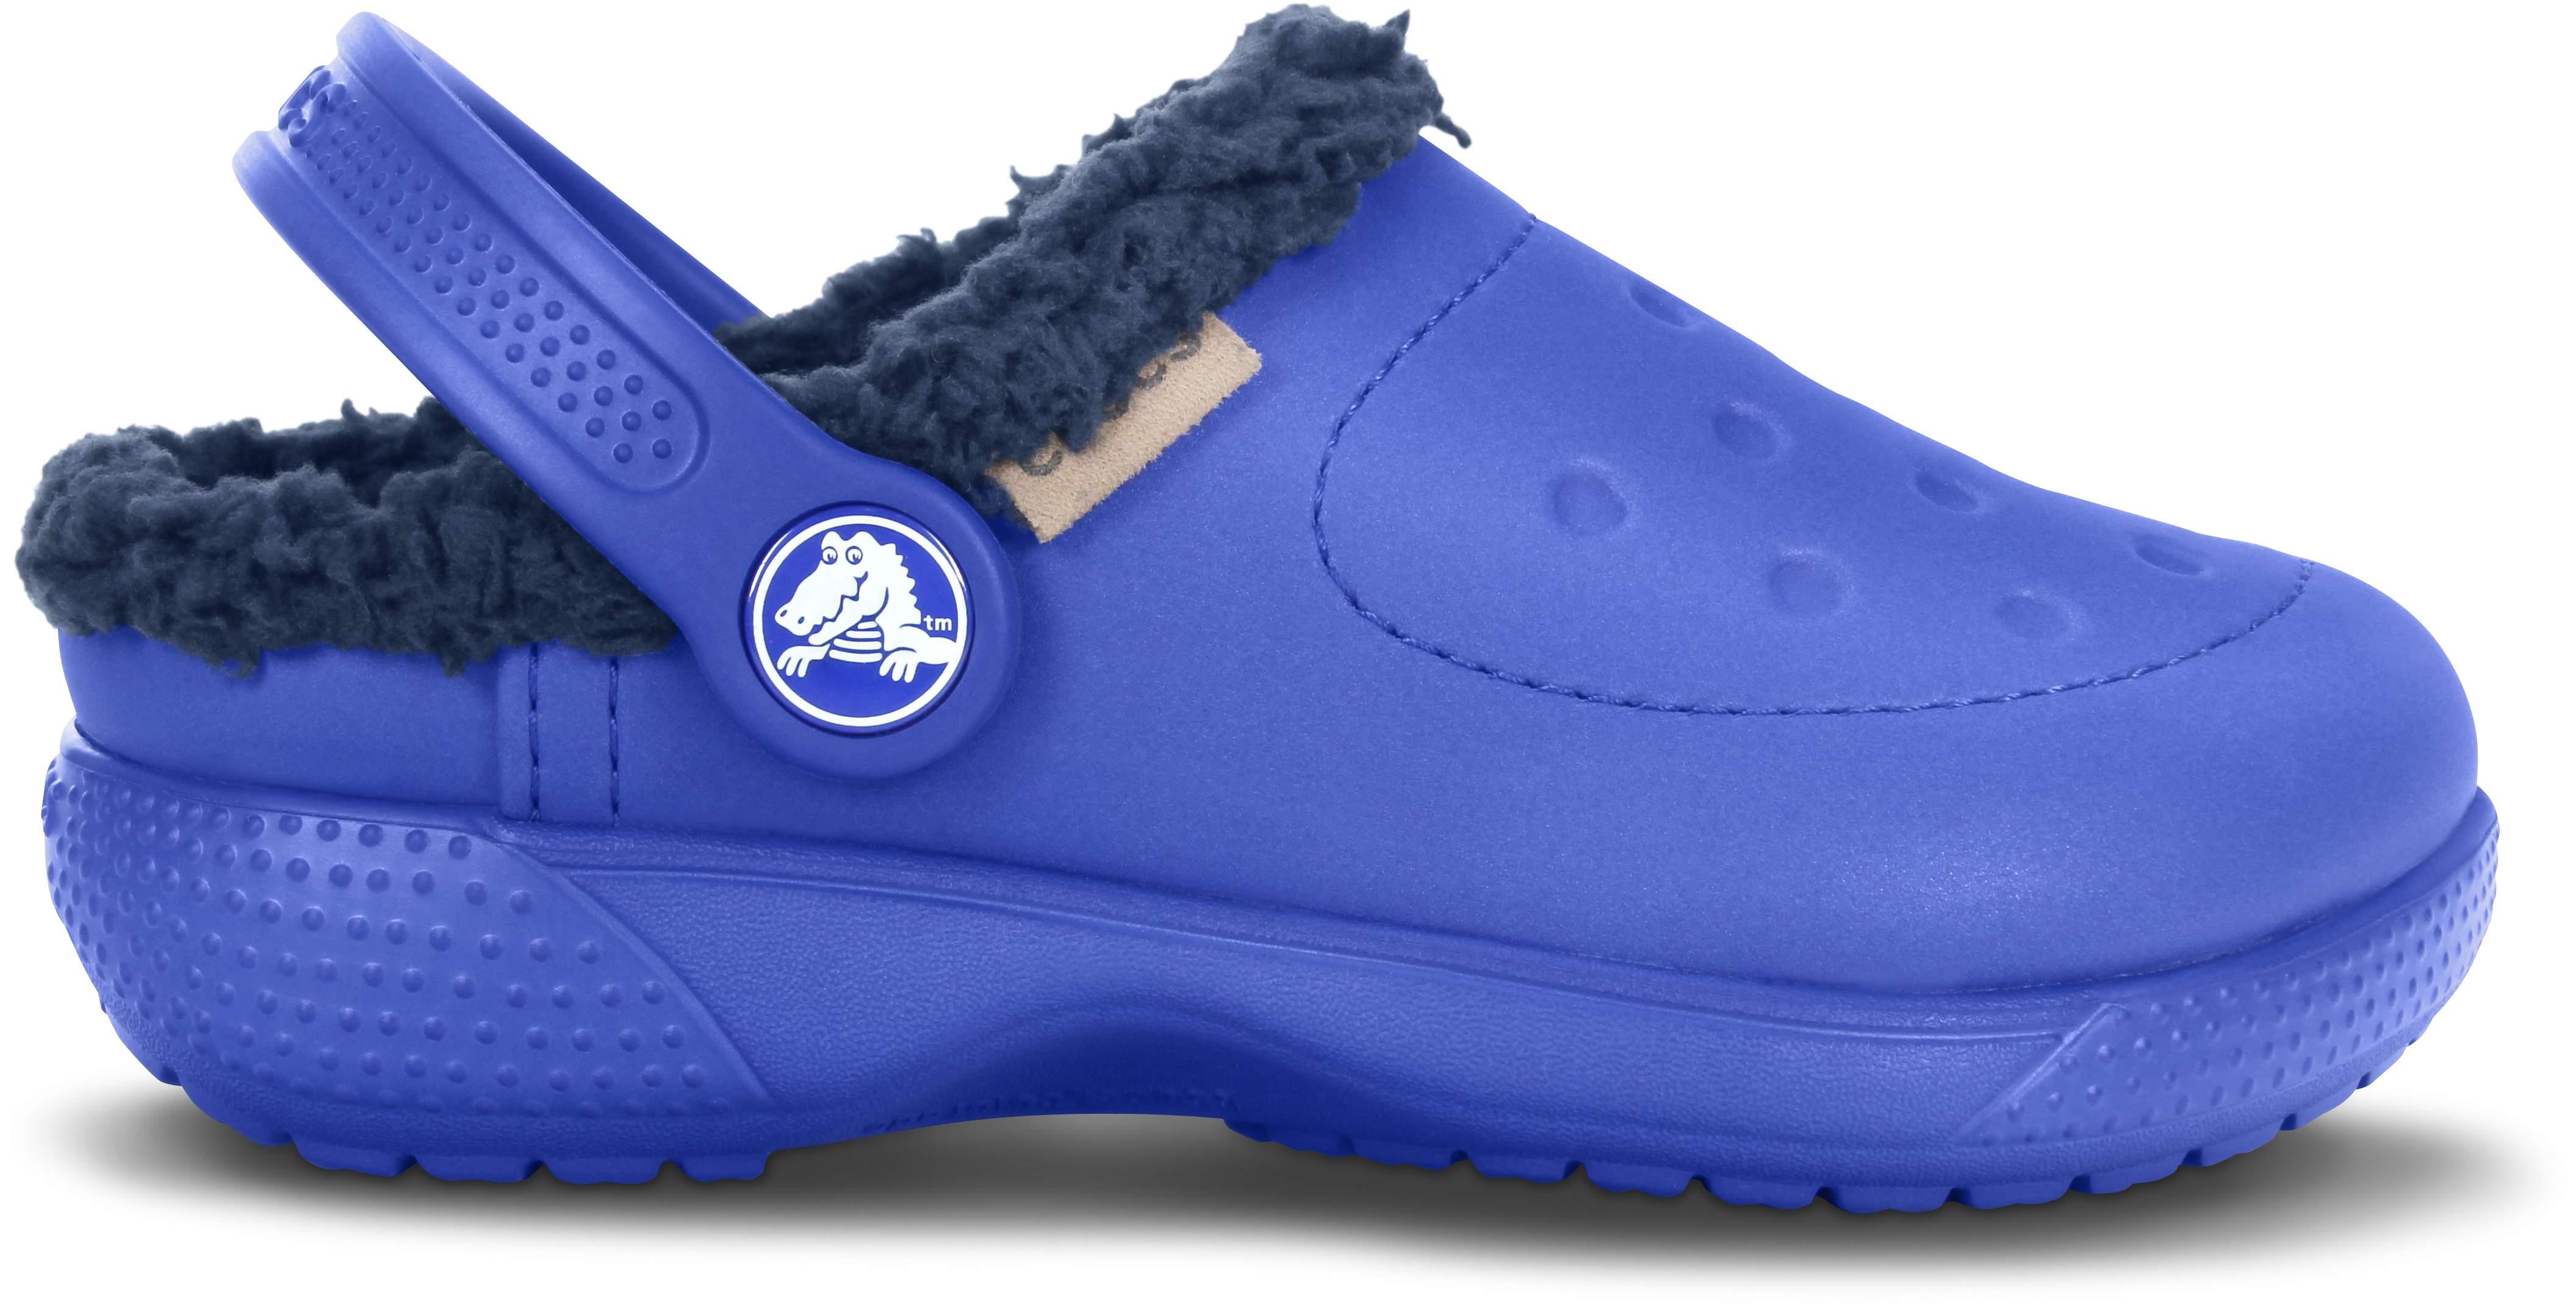 Kids'Crocs ColorLite™ Lined Clog